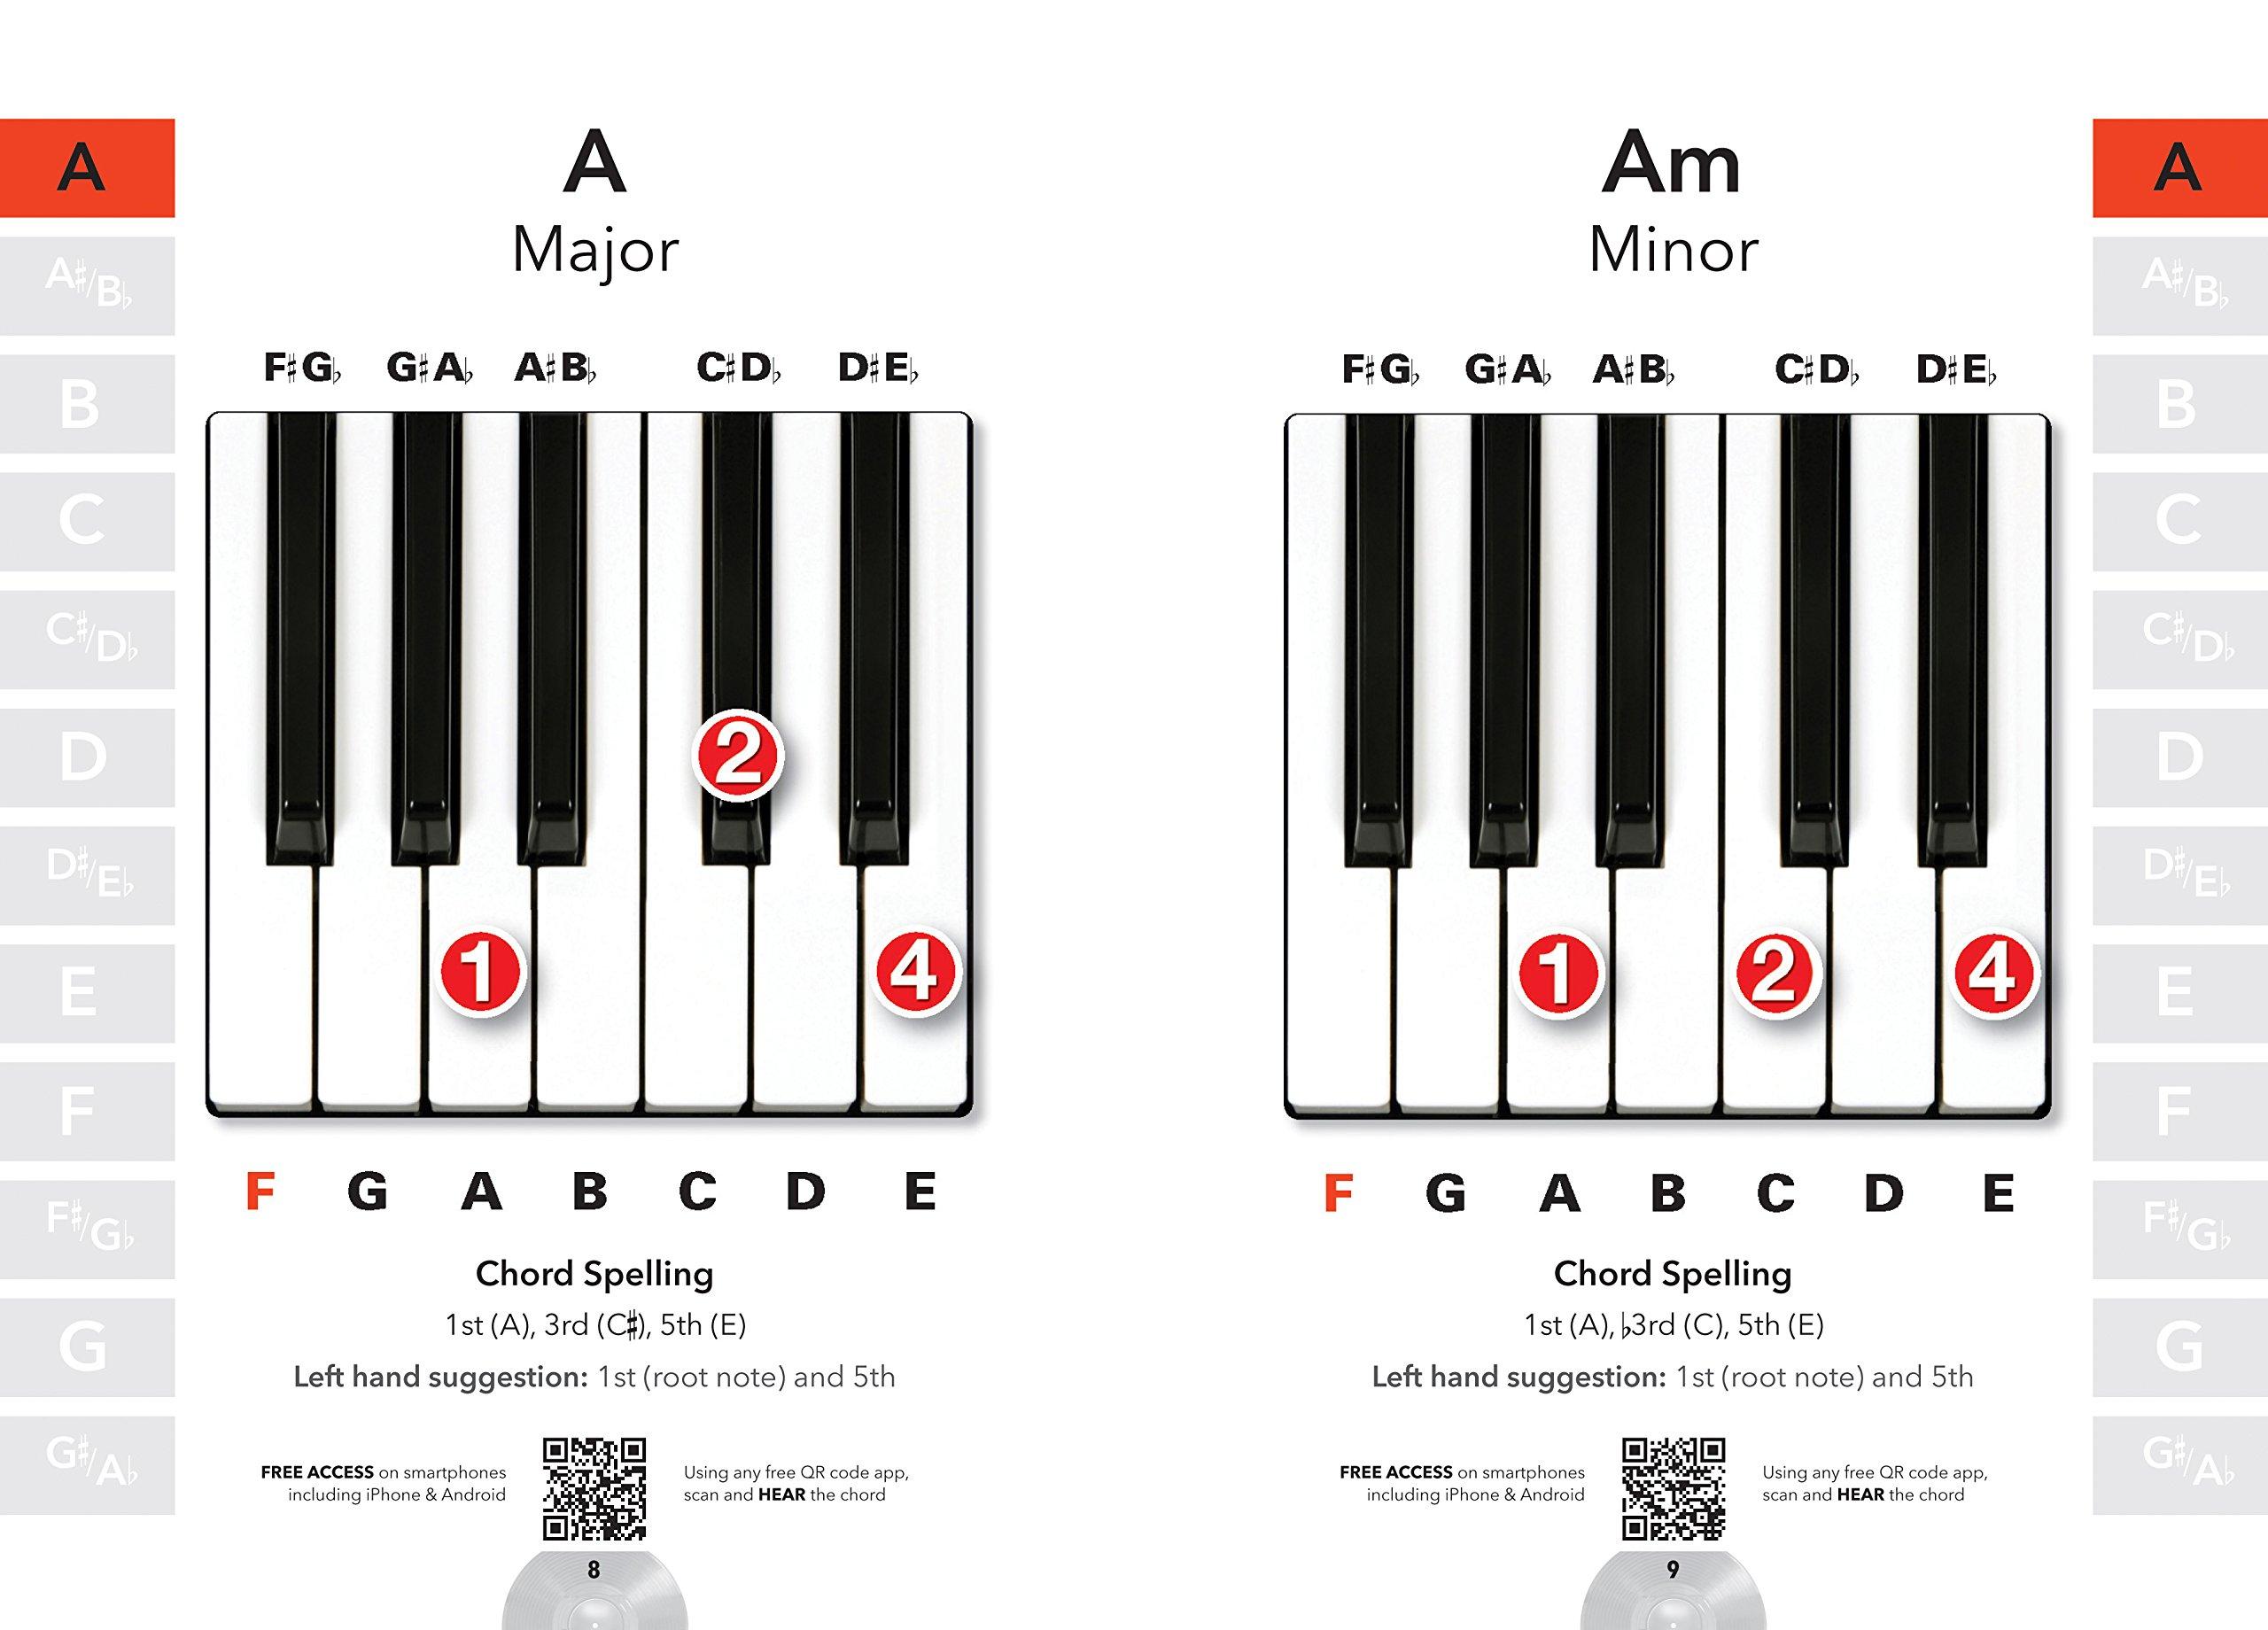 Piano chords pick up play jake jackson 9781783619214 amazon piano chords pick up play jake jackson 9781783619214 amazon books hexwebz Images